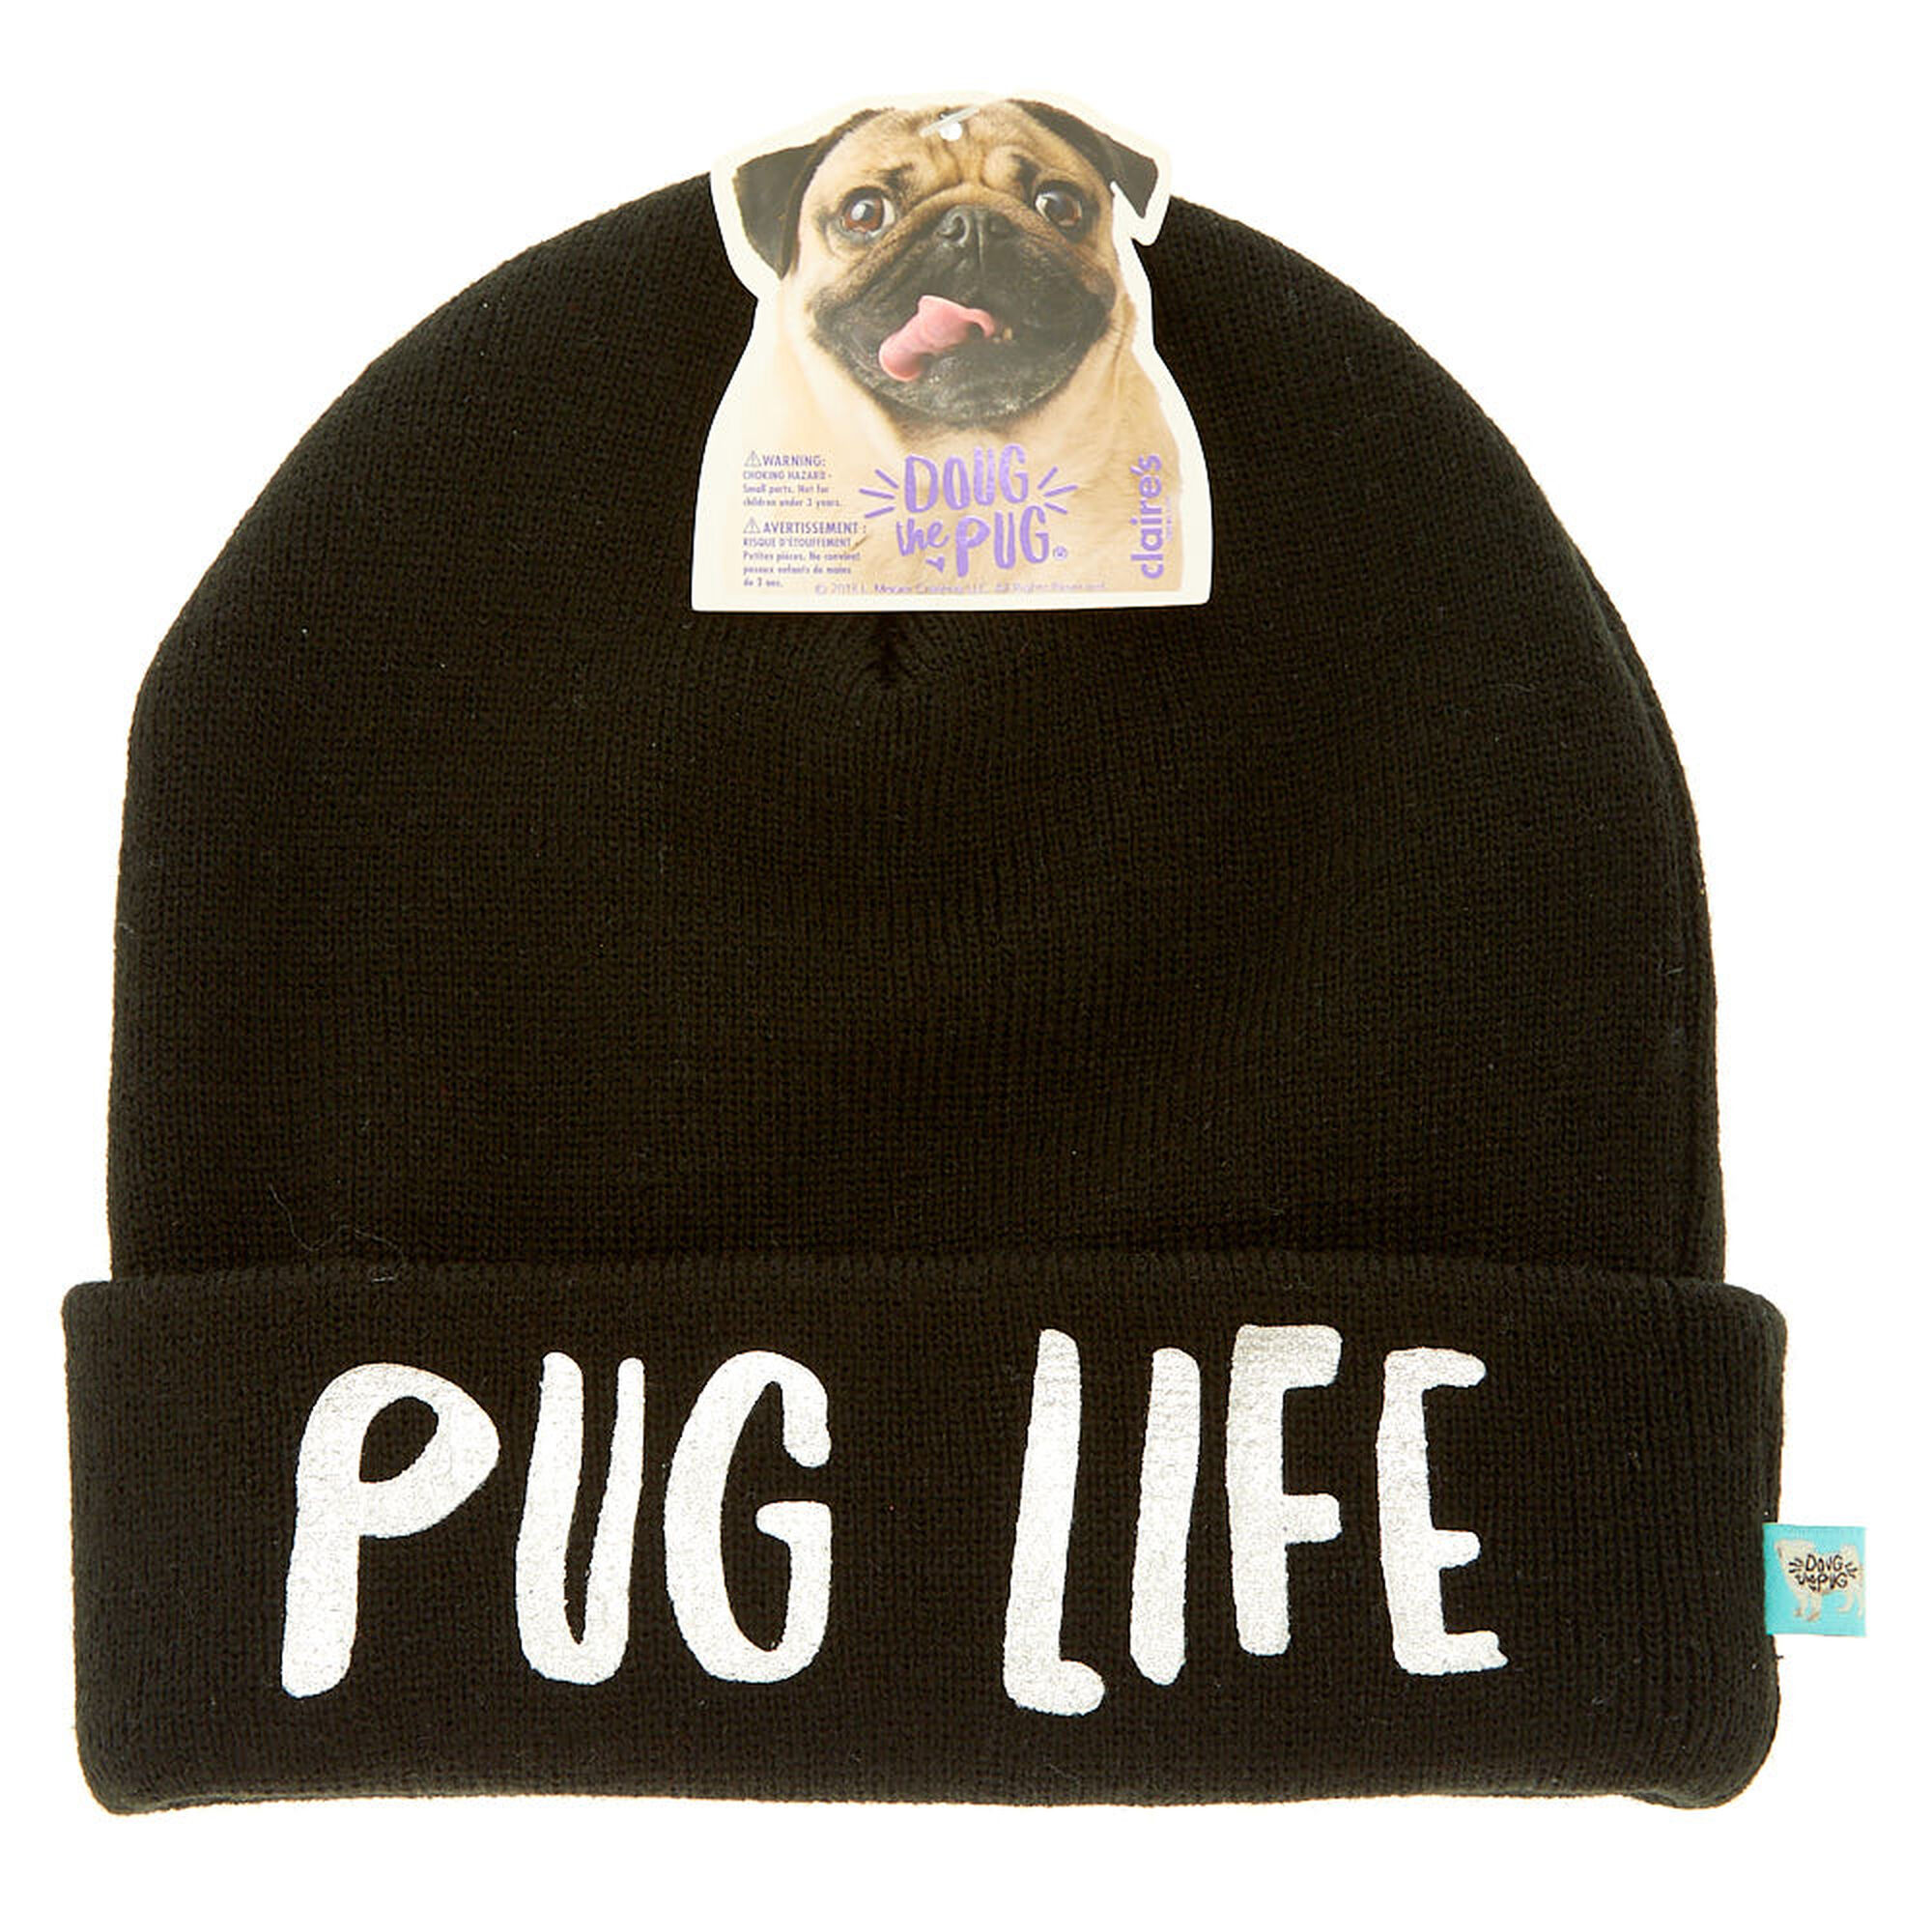 Doug The Pug reg  Pug Life Beanie- ... 2833ee59498